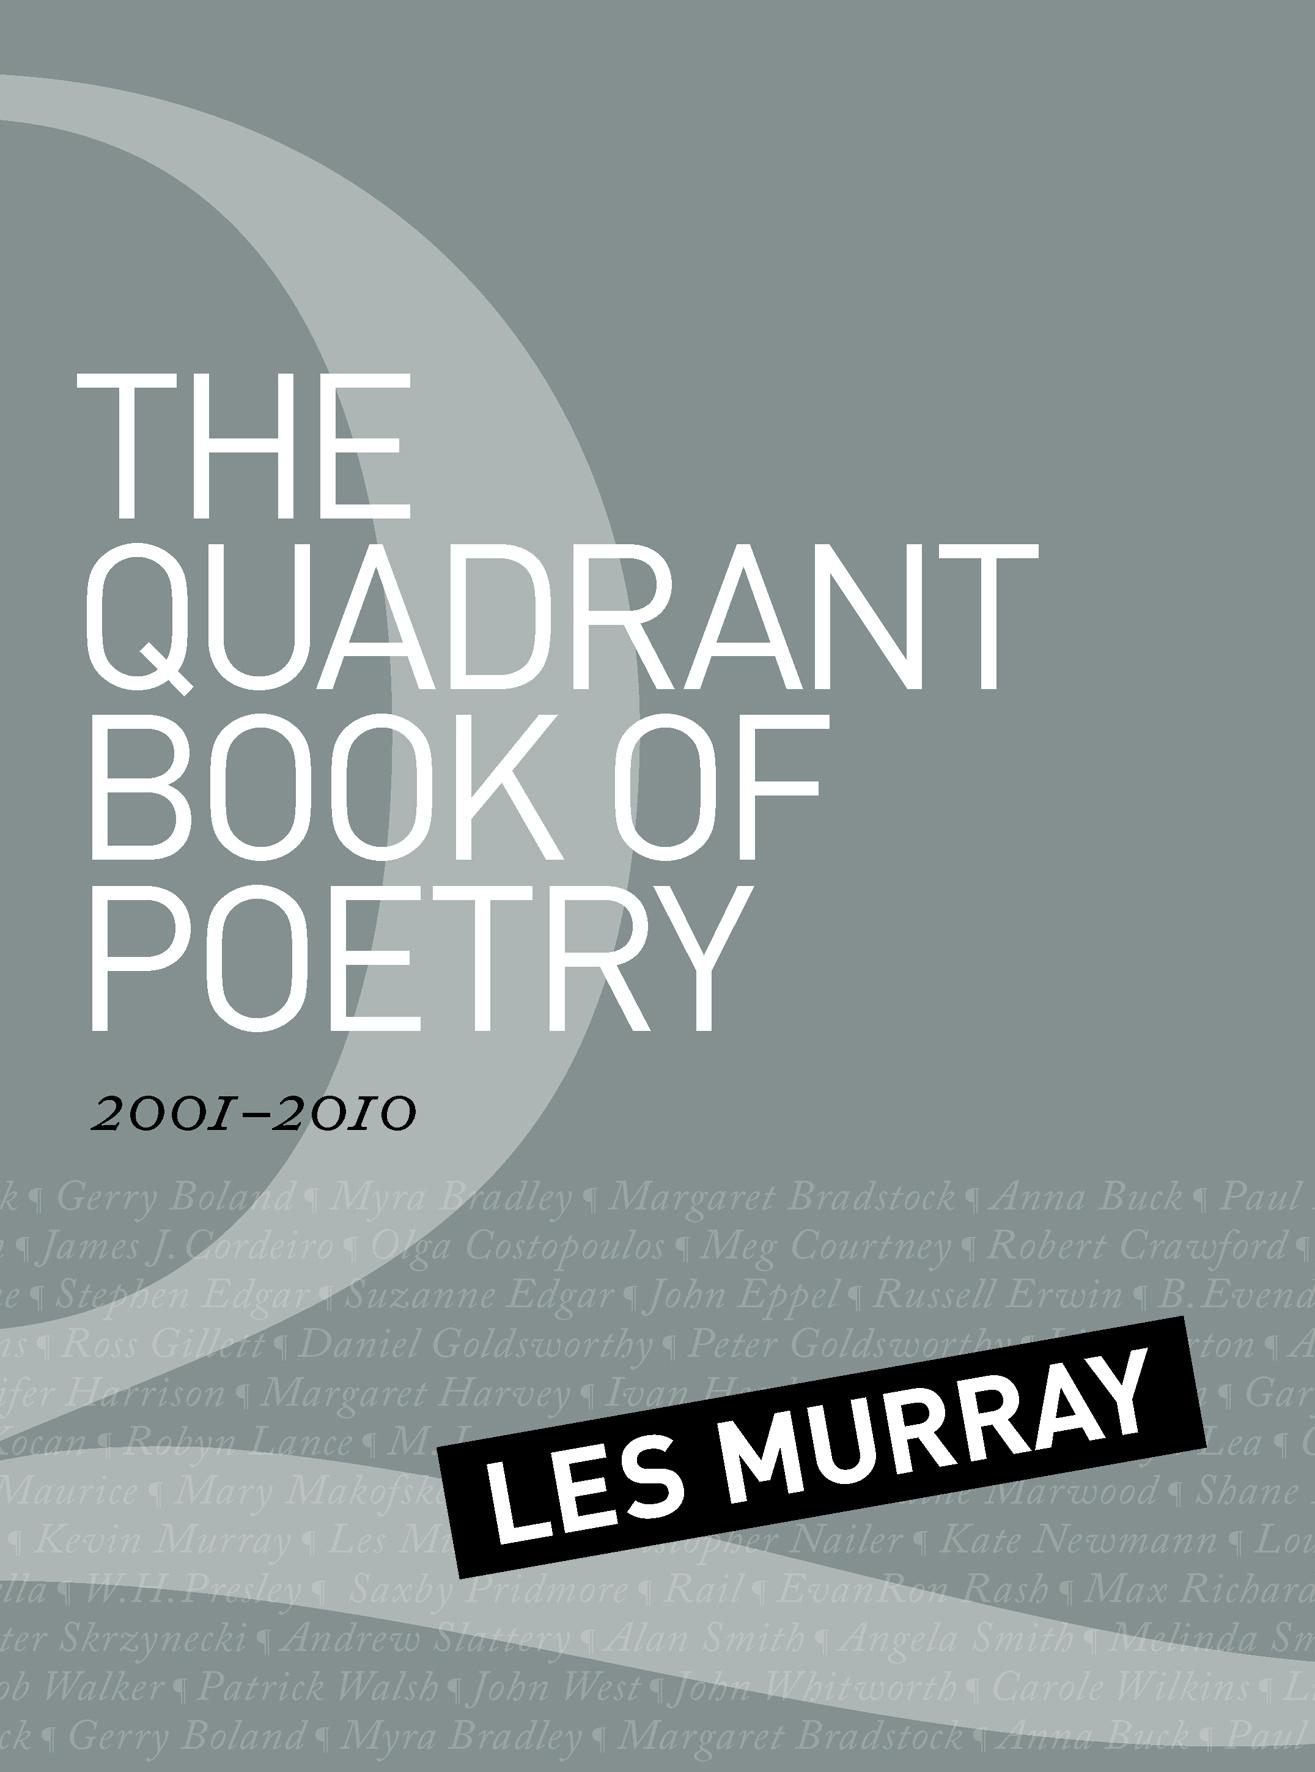 les murray poetry essay